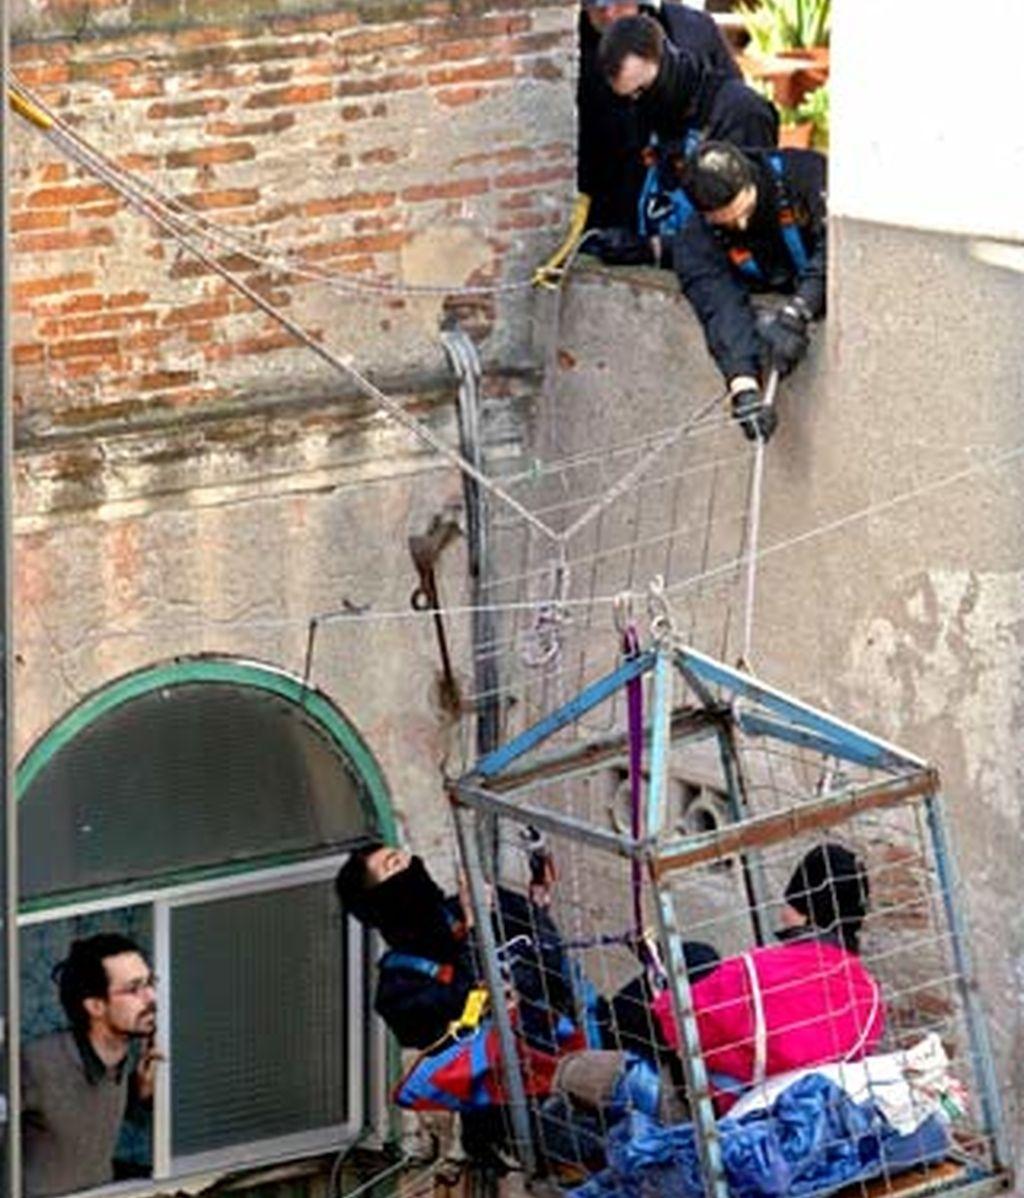 Varios mossos d'esquadra tratan de soltar a un joven que se ha encerrado en un jaula colgada en el patio interior. Foto: EFE.